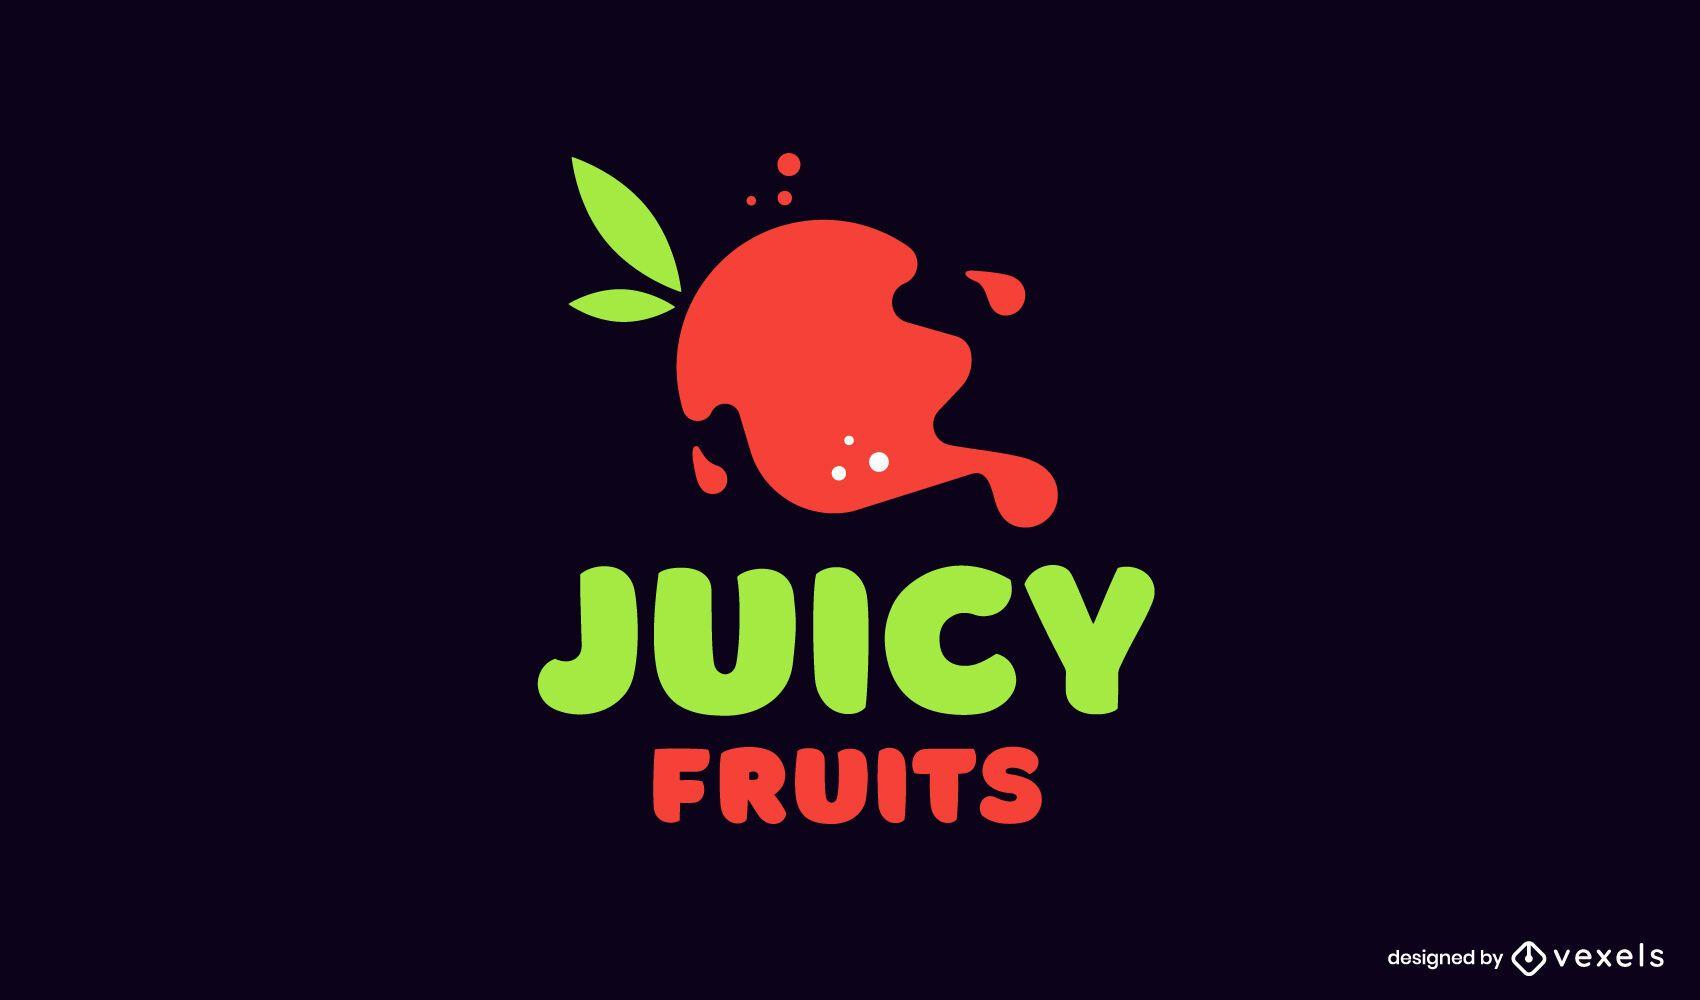 Juicy fruits logo template